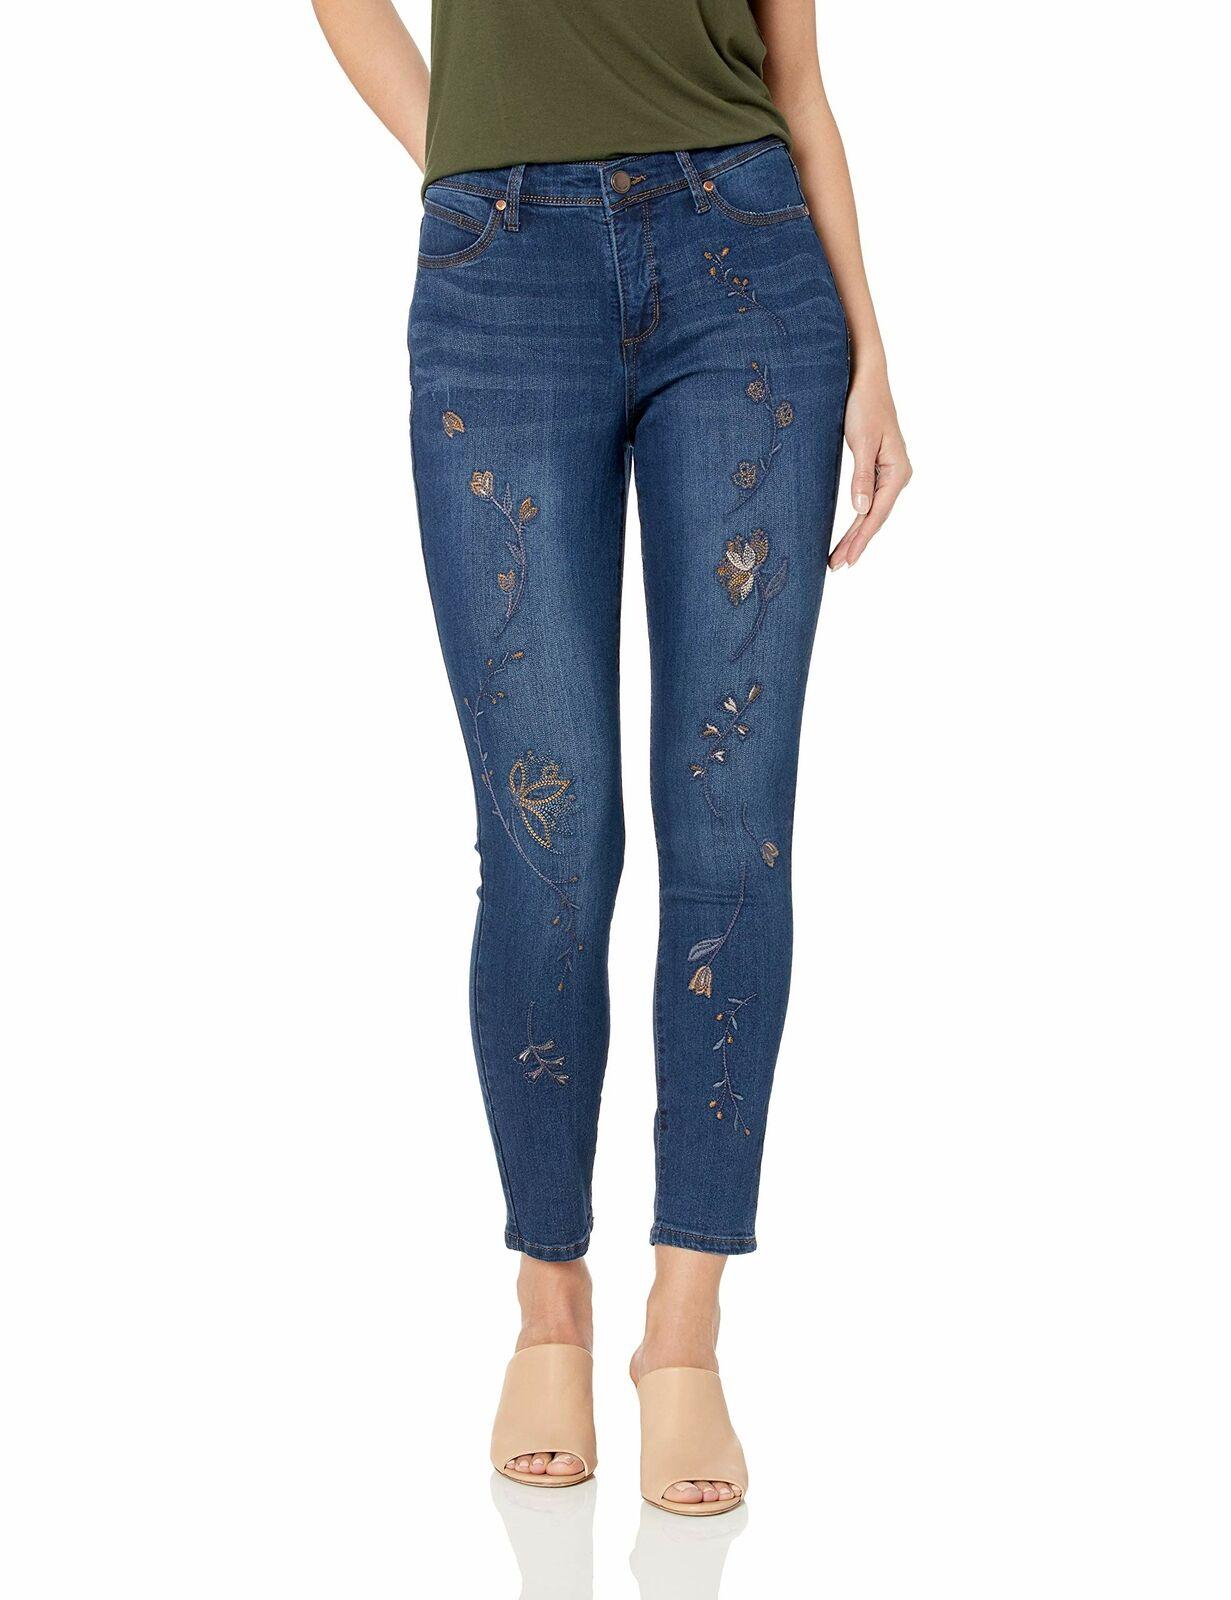 Jag Jeans Womens Petite Mera Skinny Ankle Jean in Waffle Knit Denim